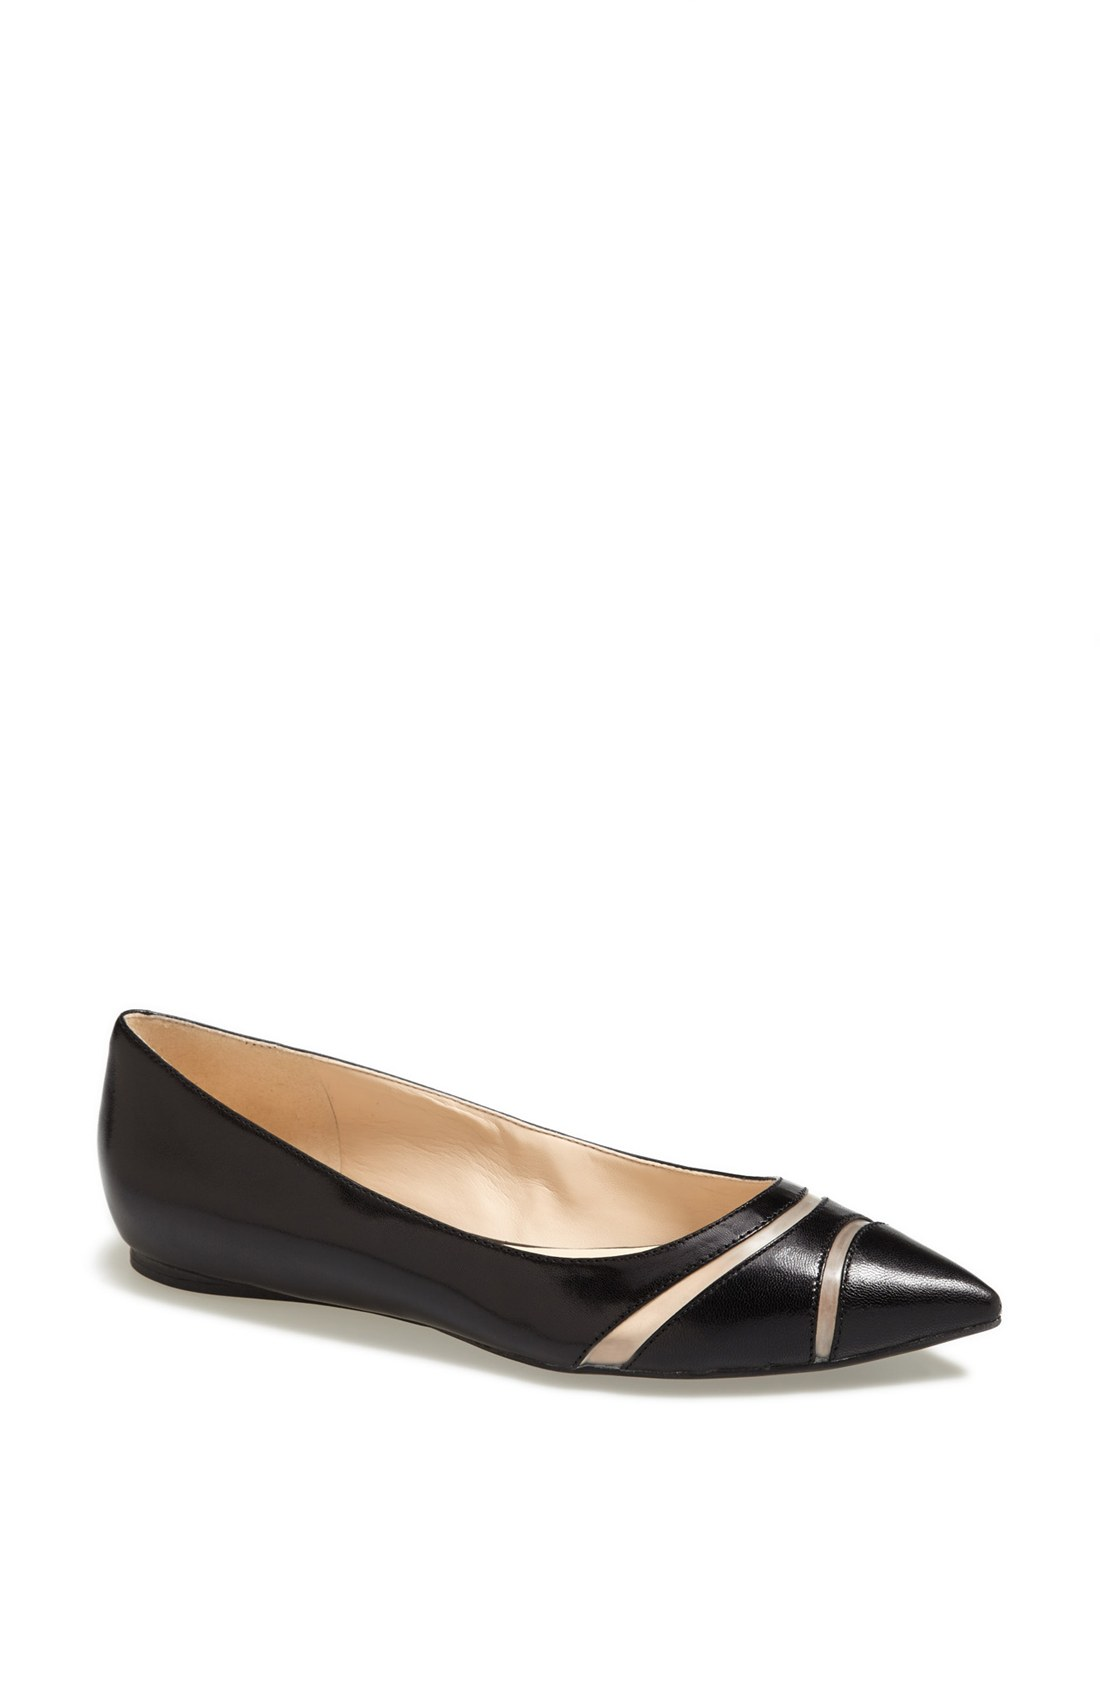 nine west auro pointy toe flat in black black leather lyst